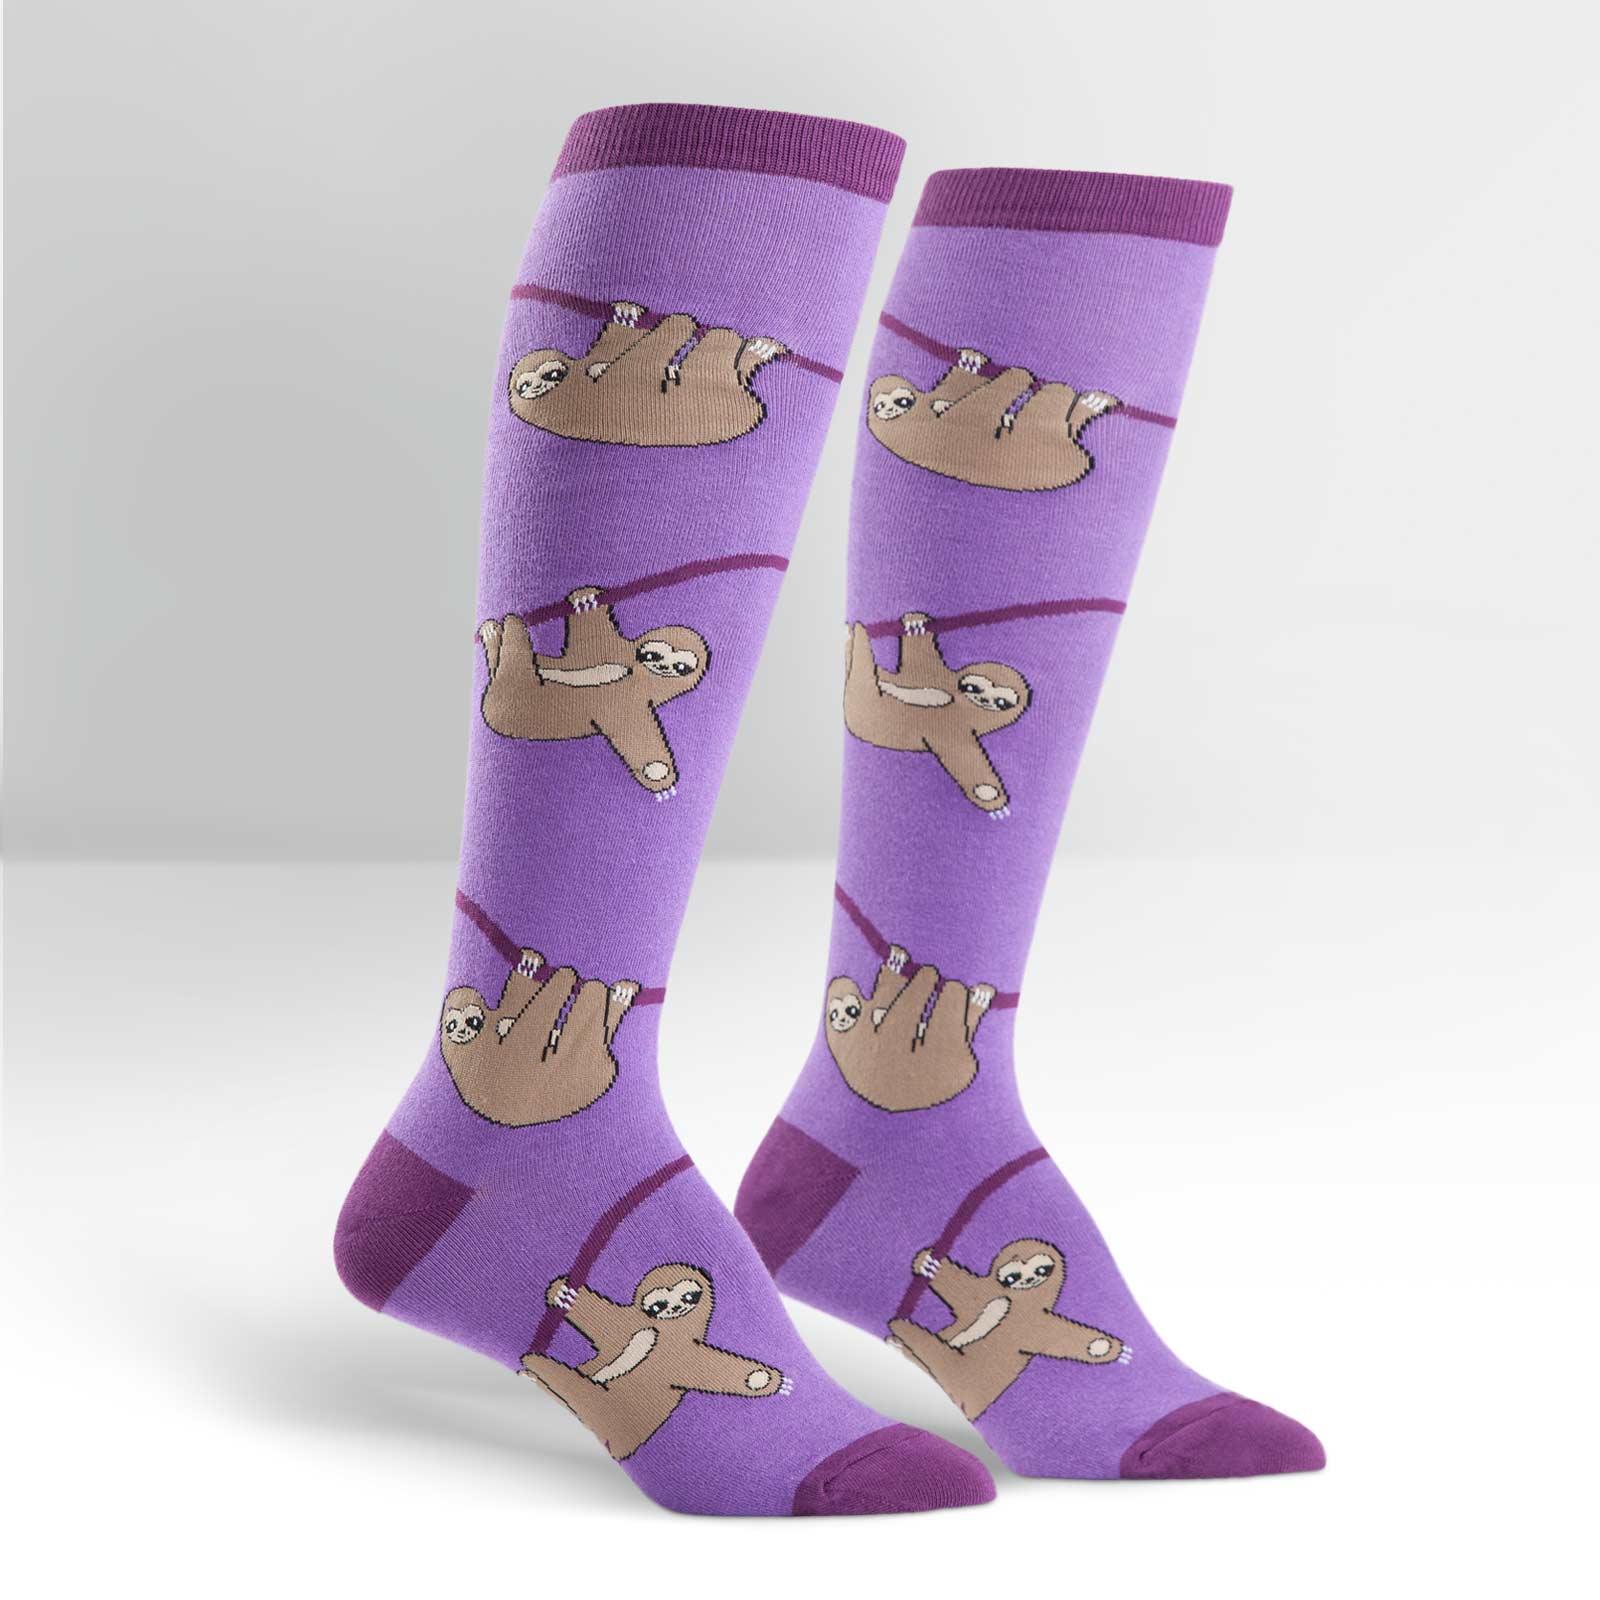 Sock It to Me Women's Knee High Funky Socks Pug Terrier ...